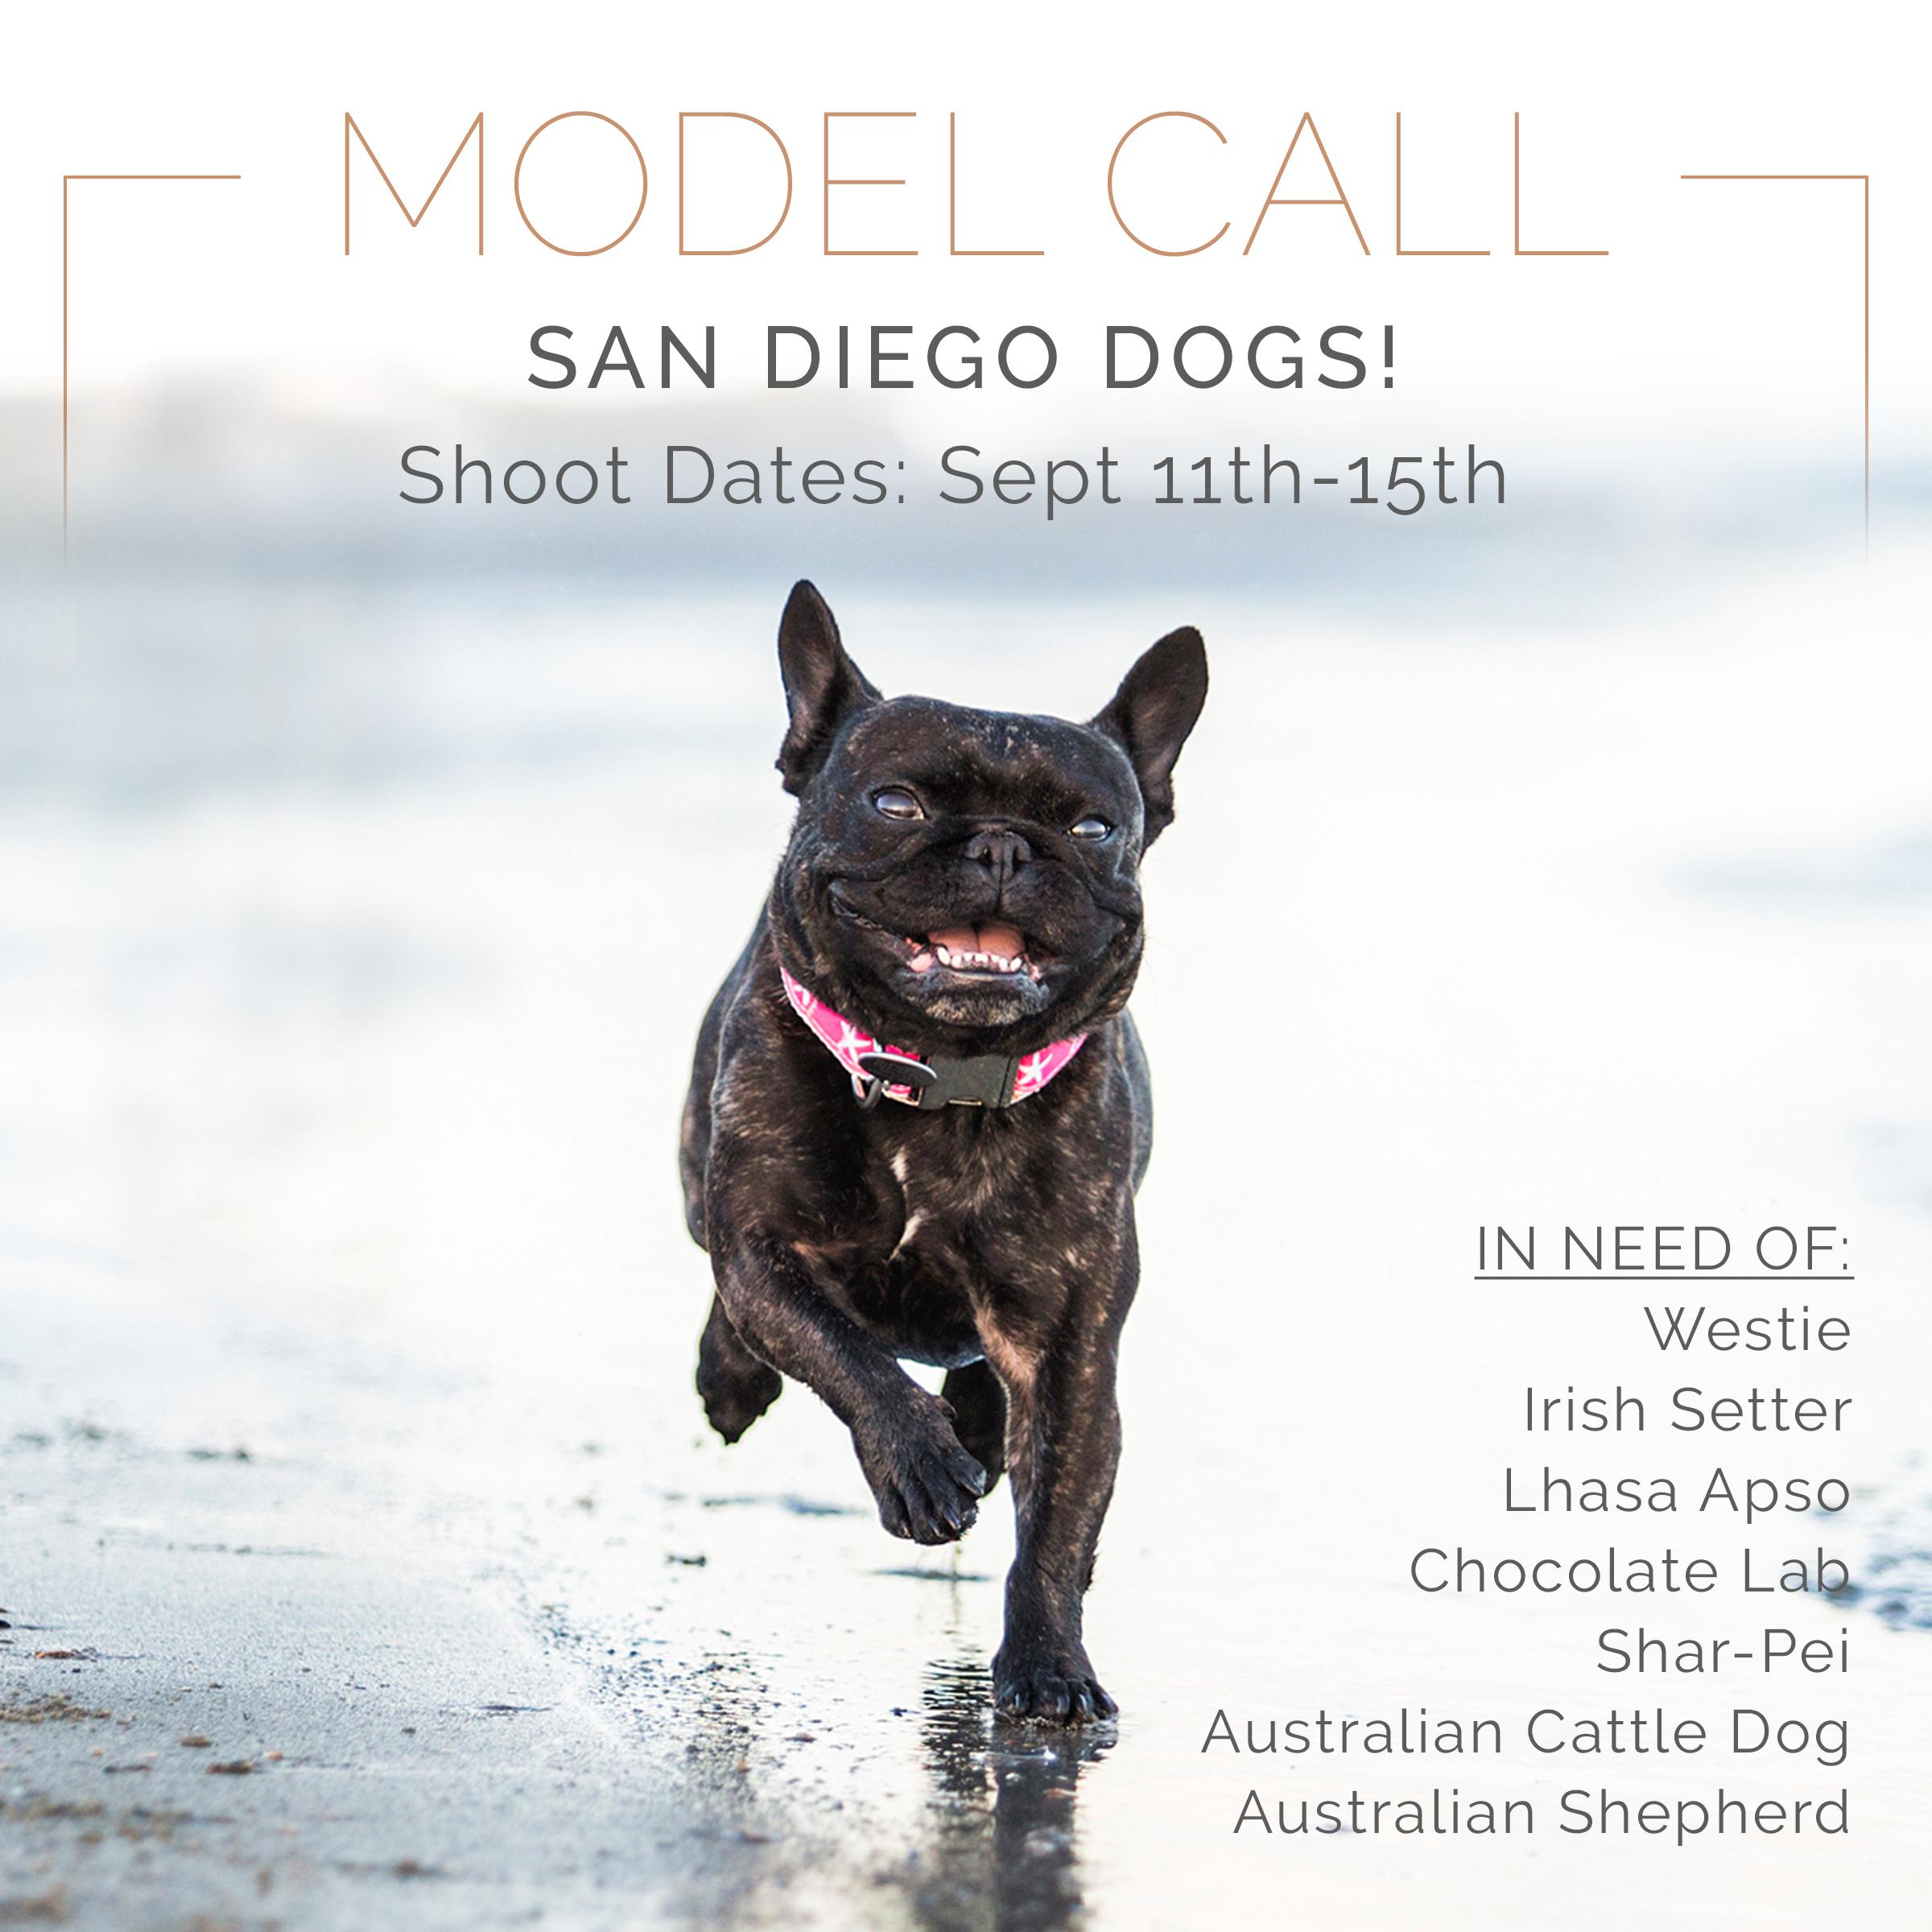 ModelCall_SanDiego.jpg